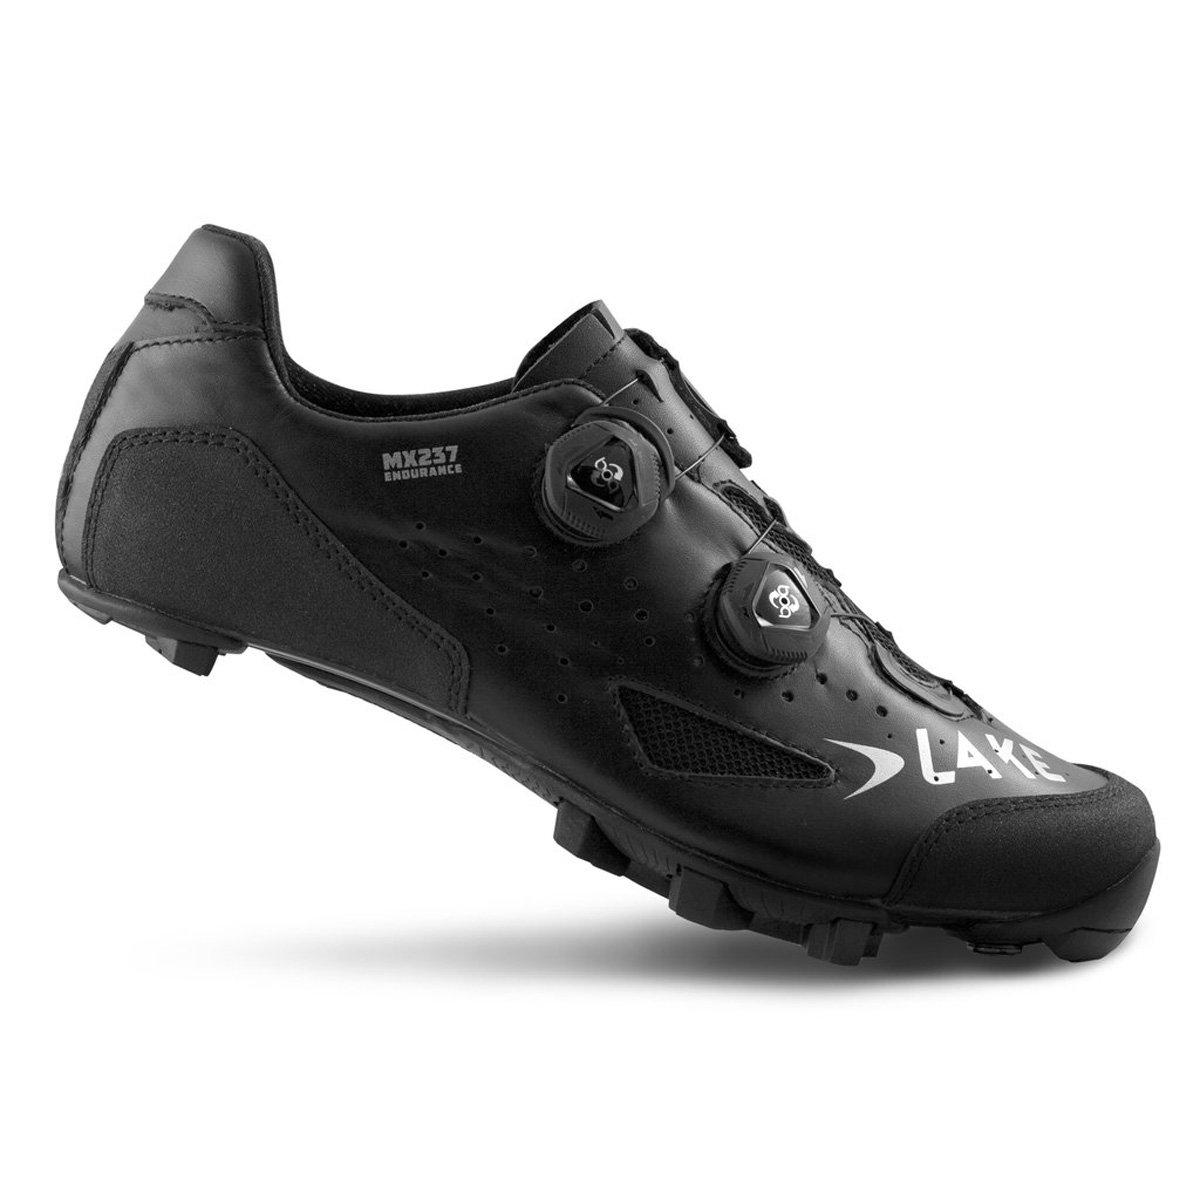 Lake mx237 Endurance Cycling Shoe – Wide – Men 'sブラック/ブラック、44.0   B07B98M3WT